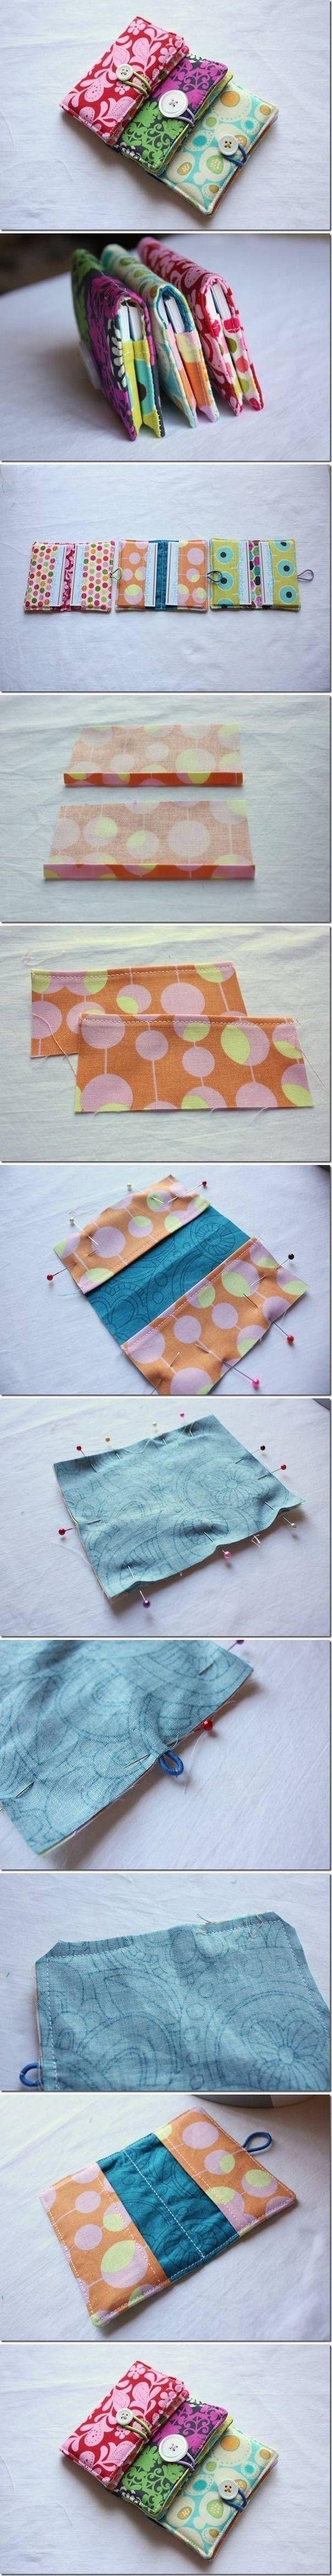 DIY Sew Business Card Holder flowers handbag diy crafts home made easy crafts craft idea crafts ideas diy ideas diy crafts diy idea do it yourself diy projects diy craft handmade: